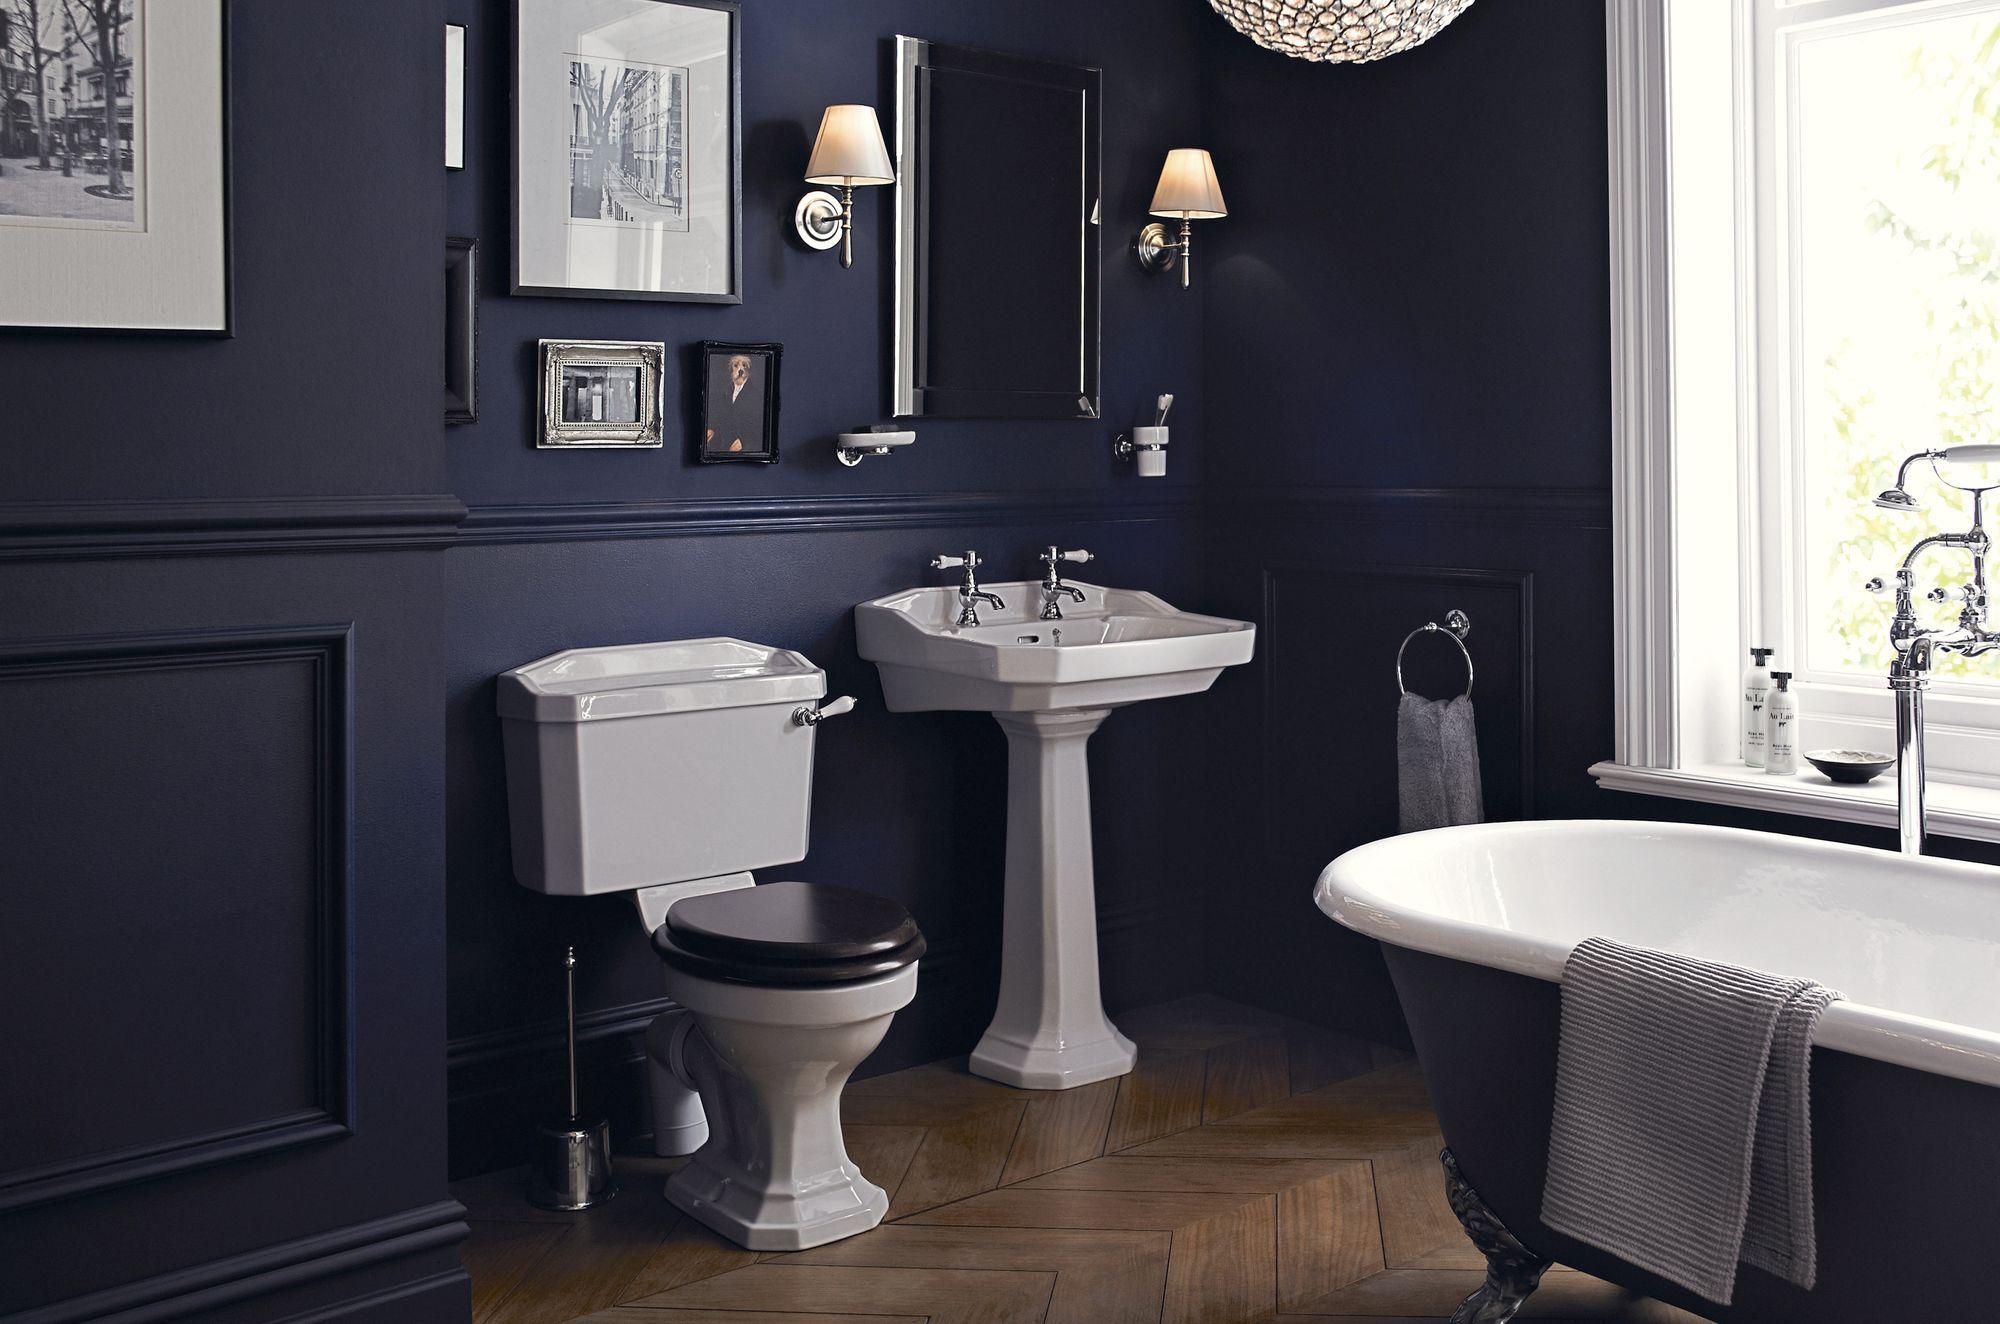 granley suite – traditional bathrooms - badezimmereinrichtungen